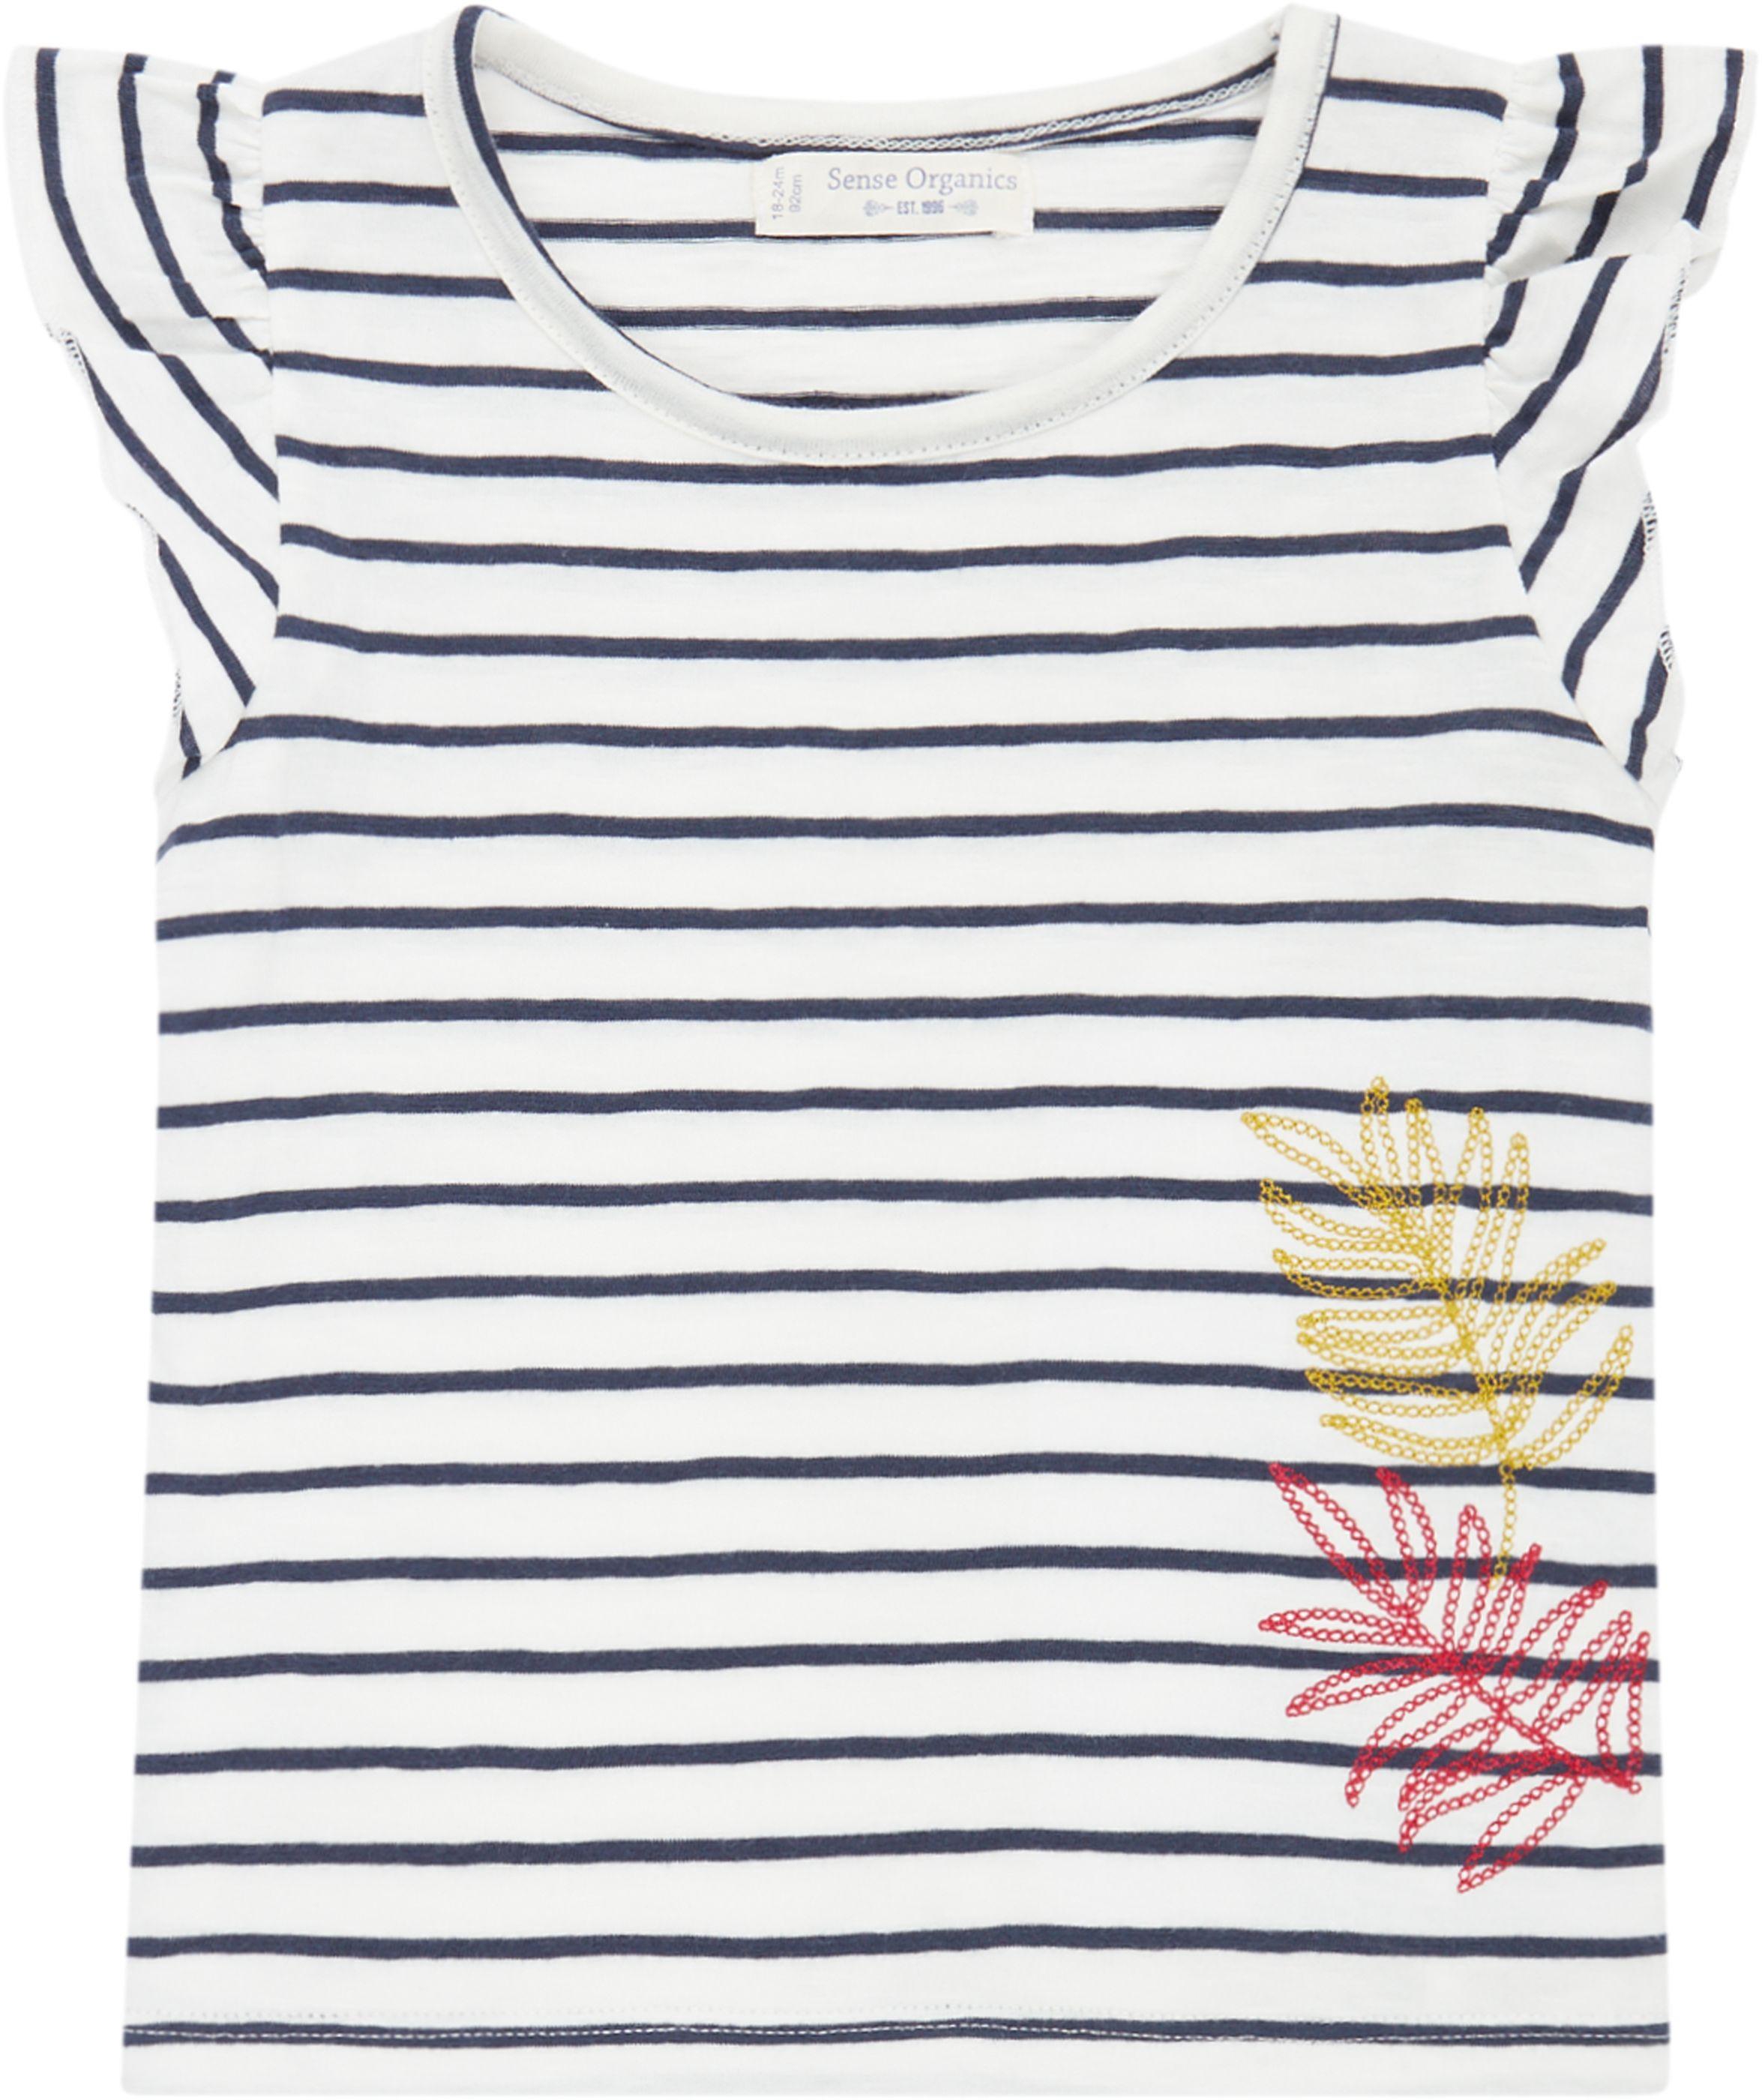 Sense Organic NANA Butterfly Shirt Kurzarm Navy Stripes